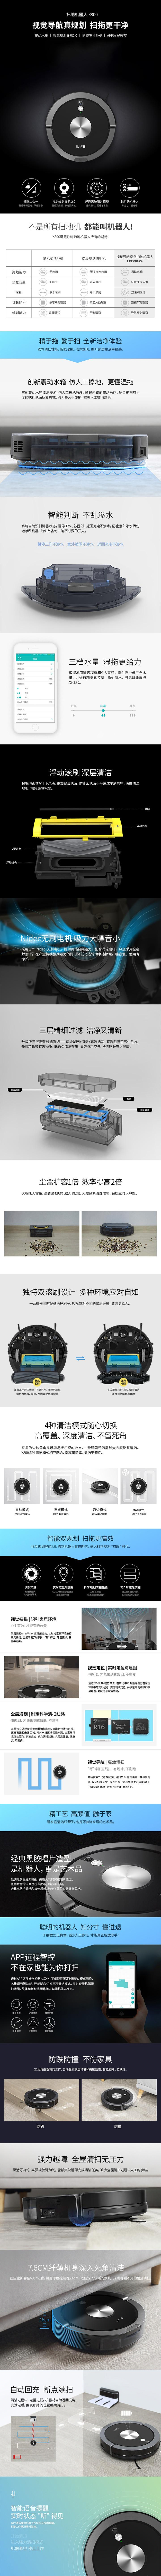 ILIFE智意导航扫地机器人免费试用,评测